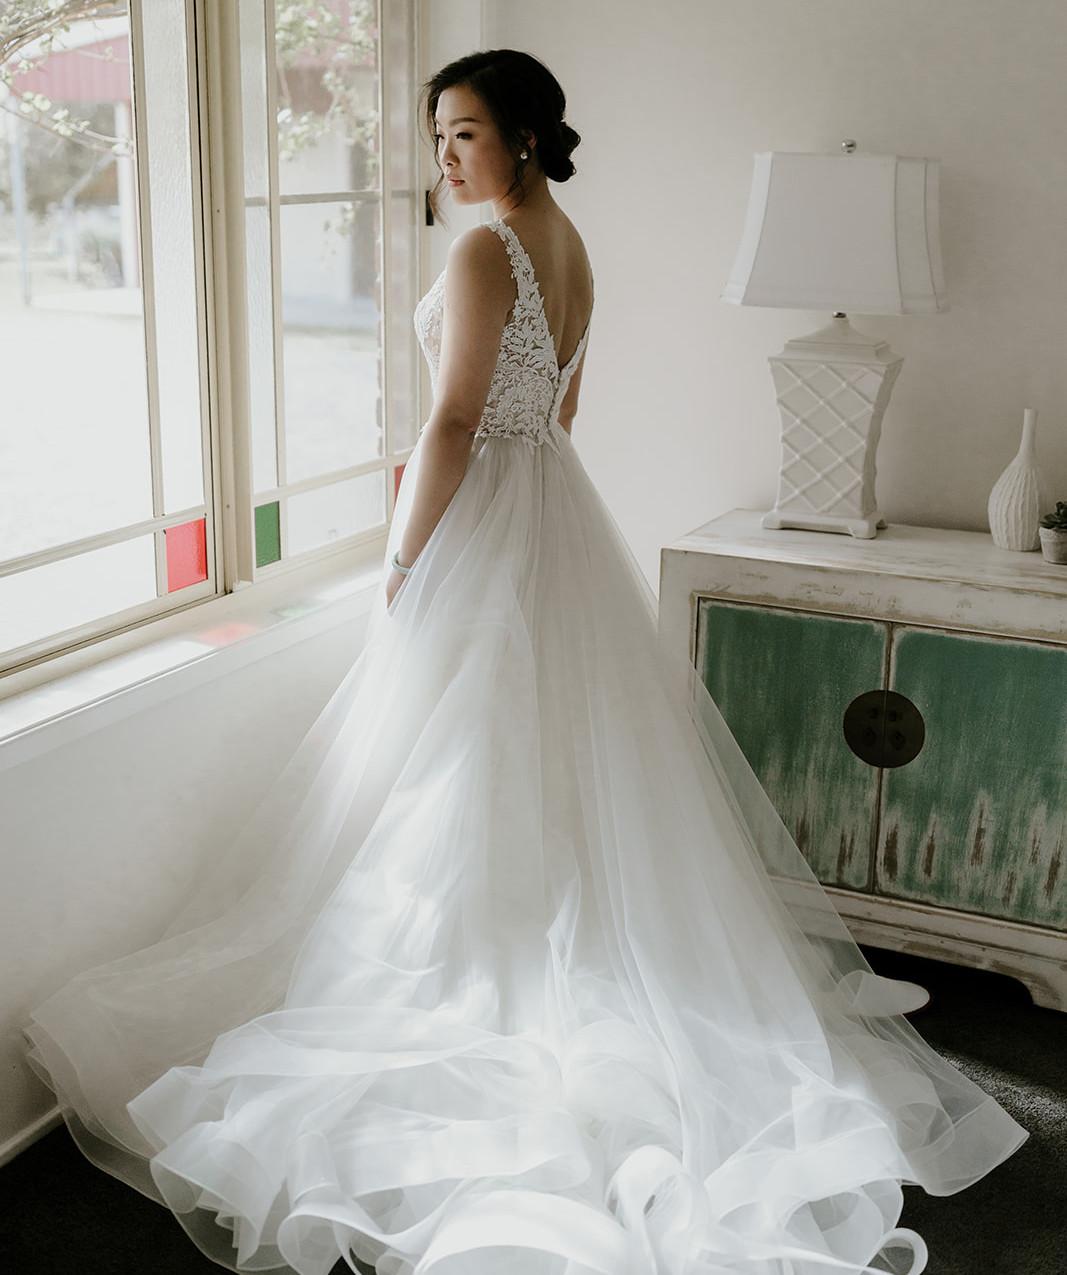 Bridal Makeup Artist Sydney  Photography: Zoe Morley Photography